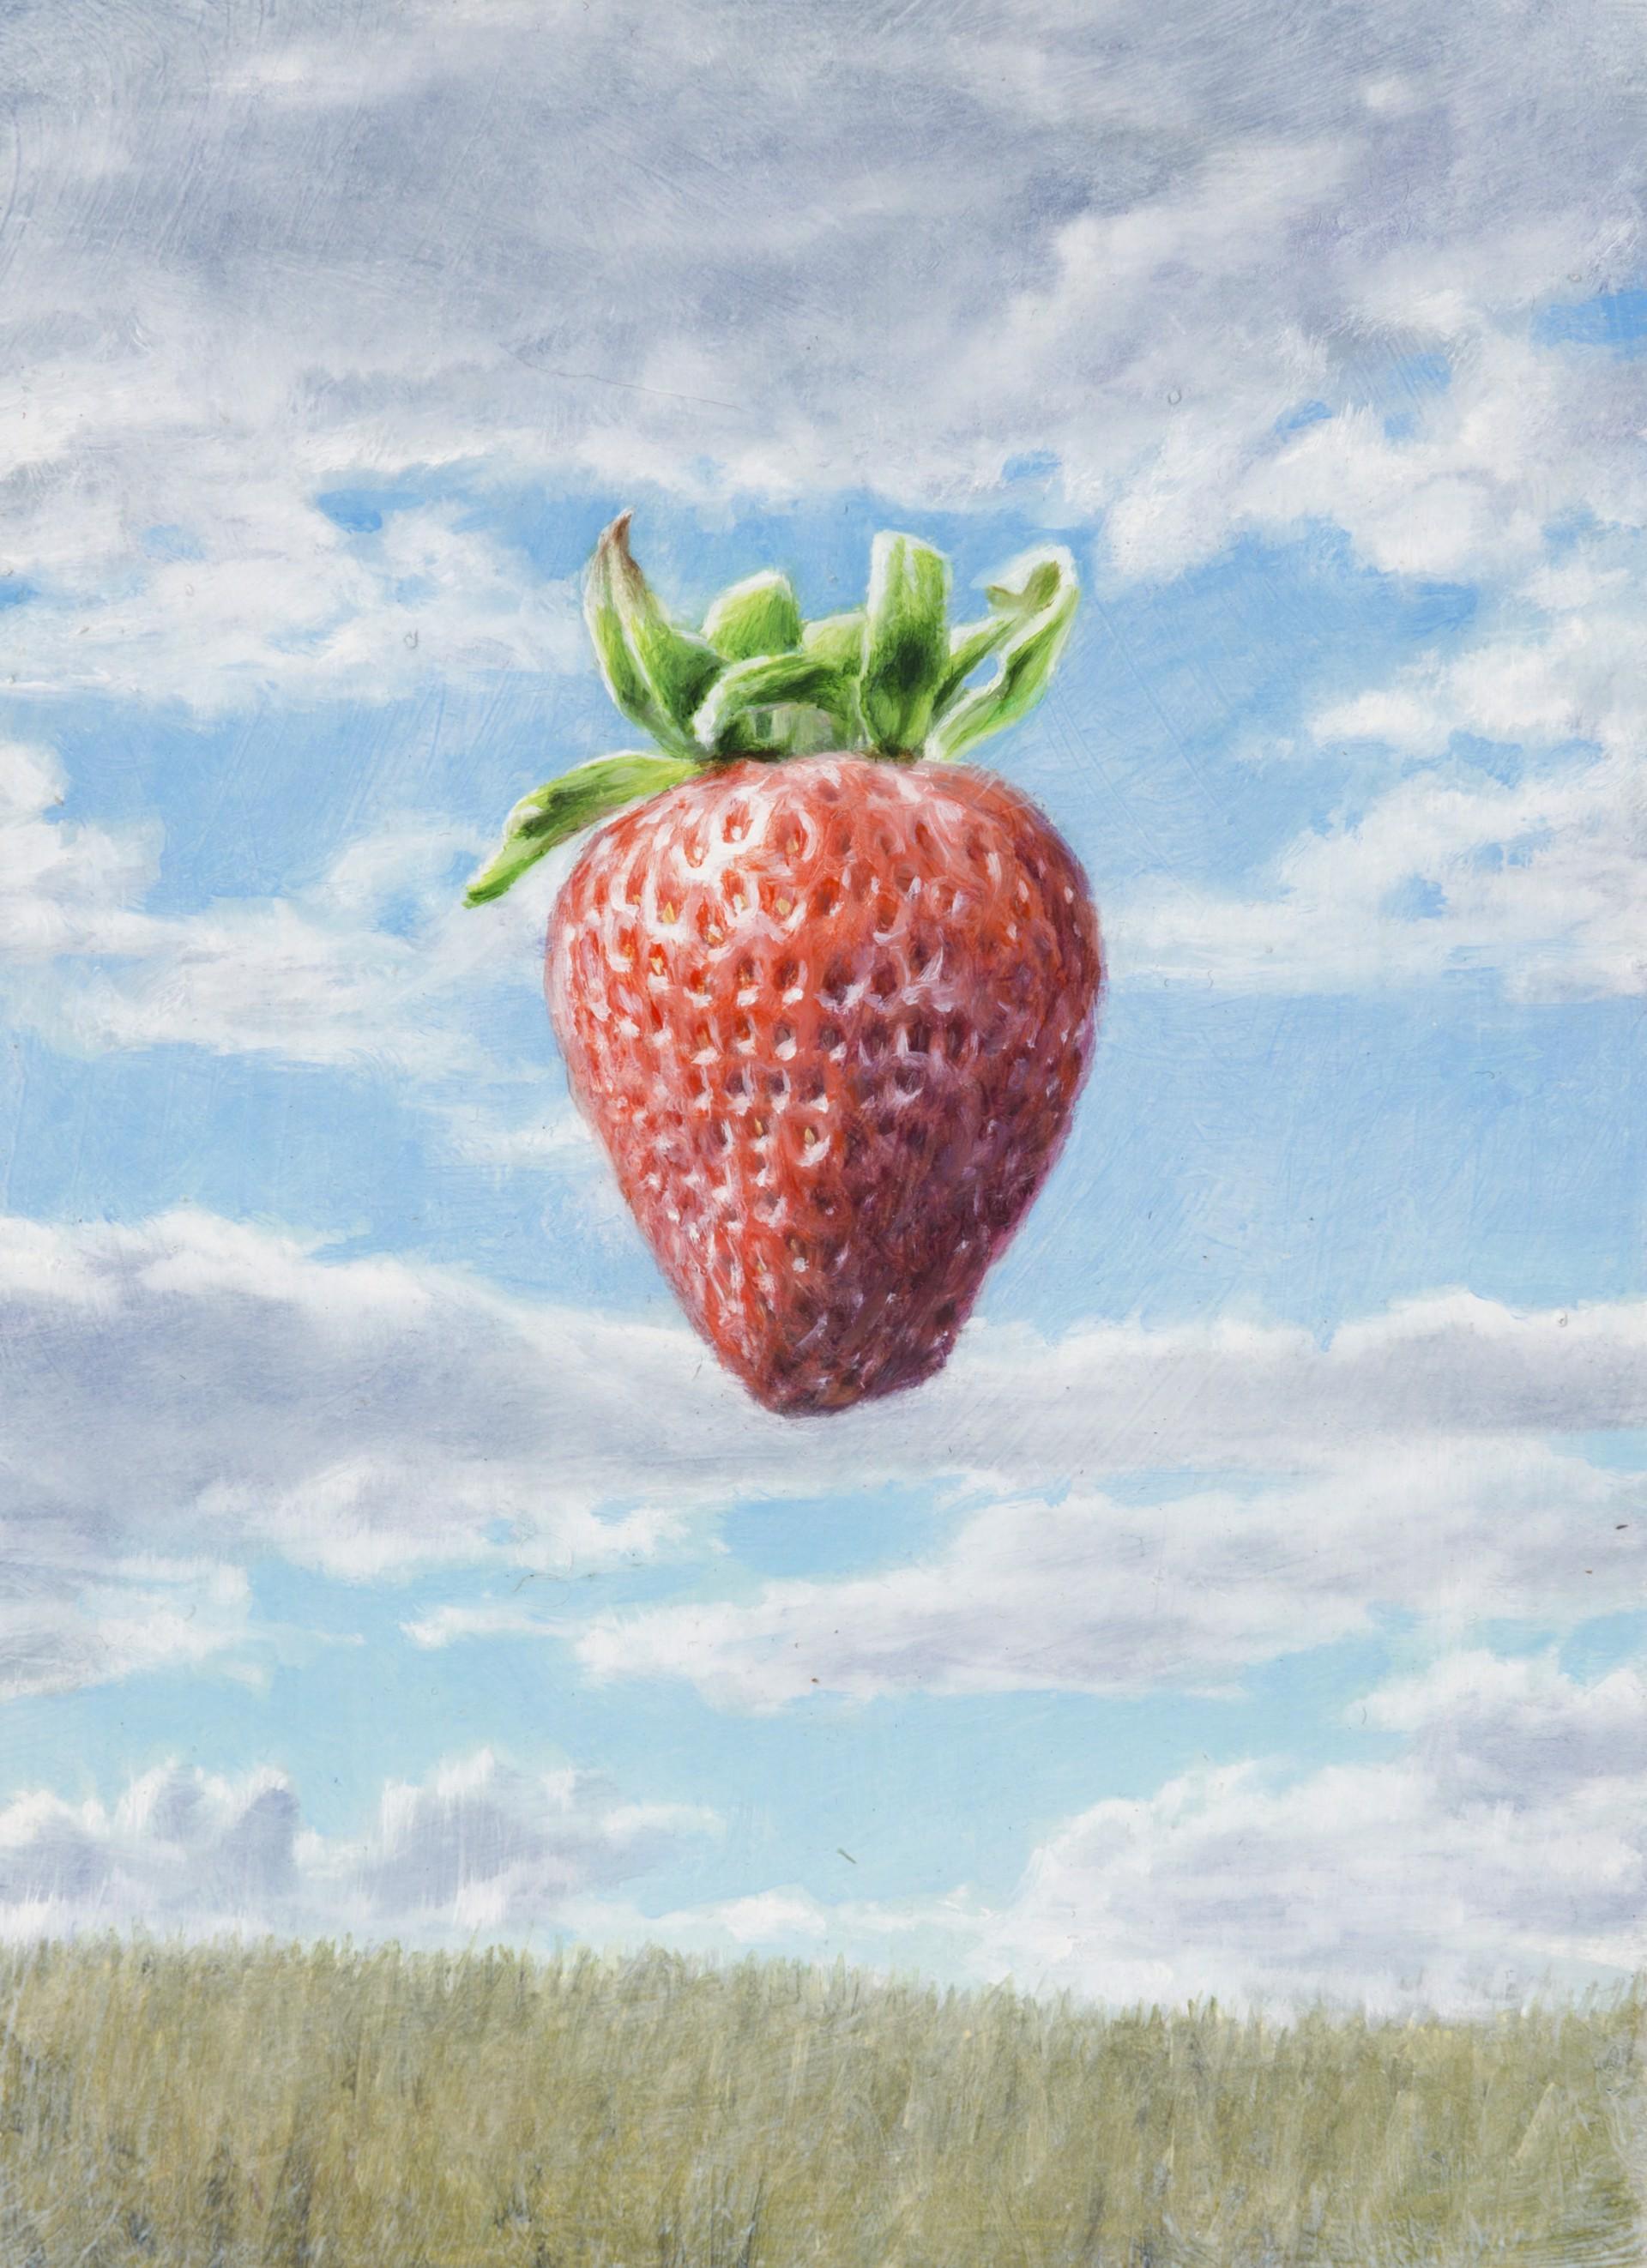 Strawberry Fields by Gregory Block